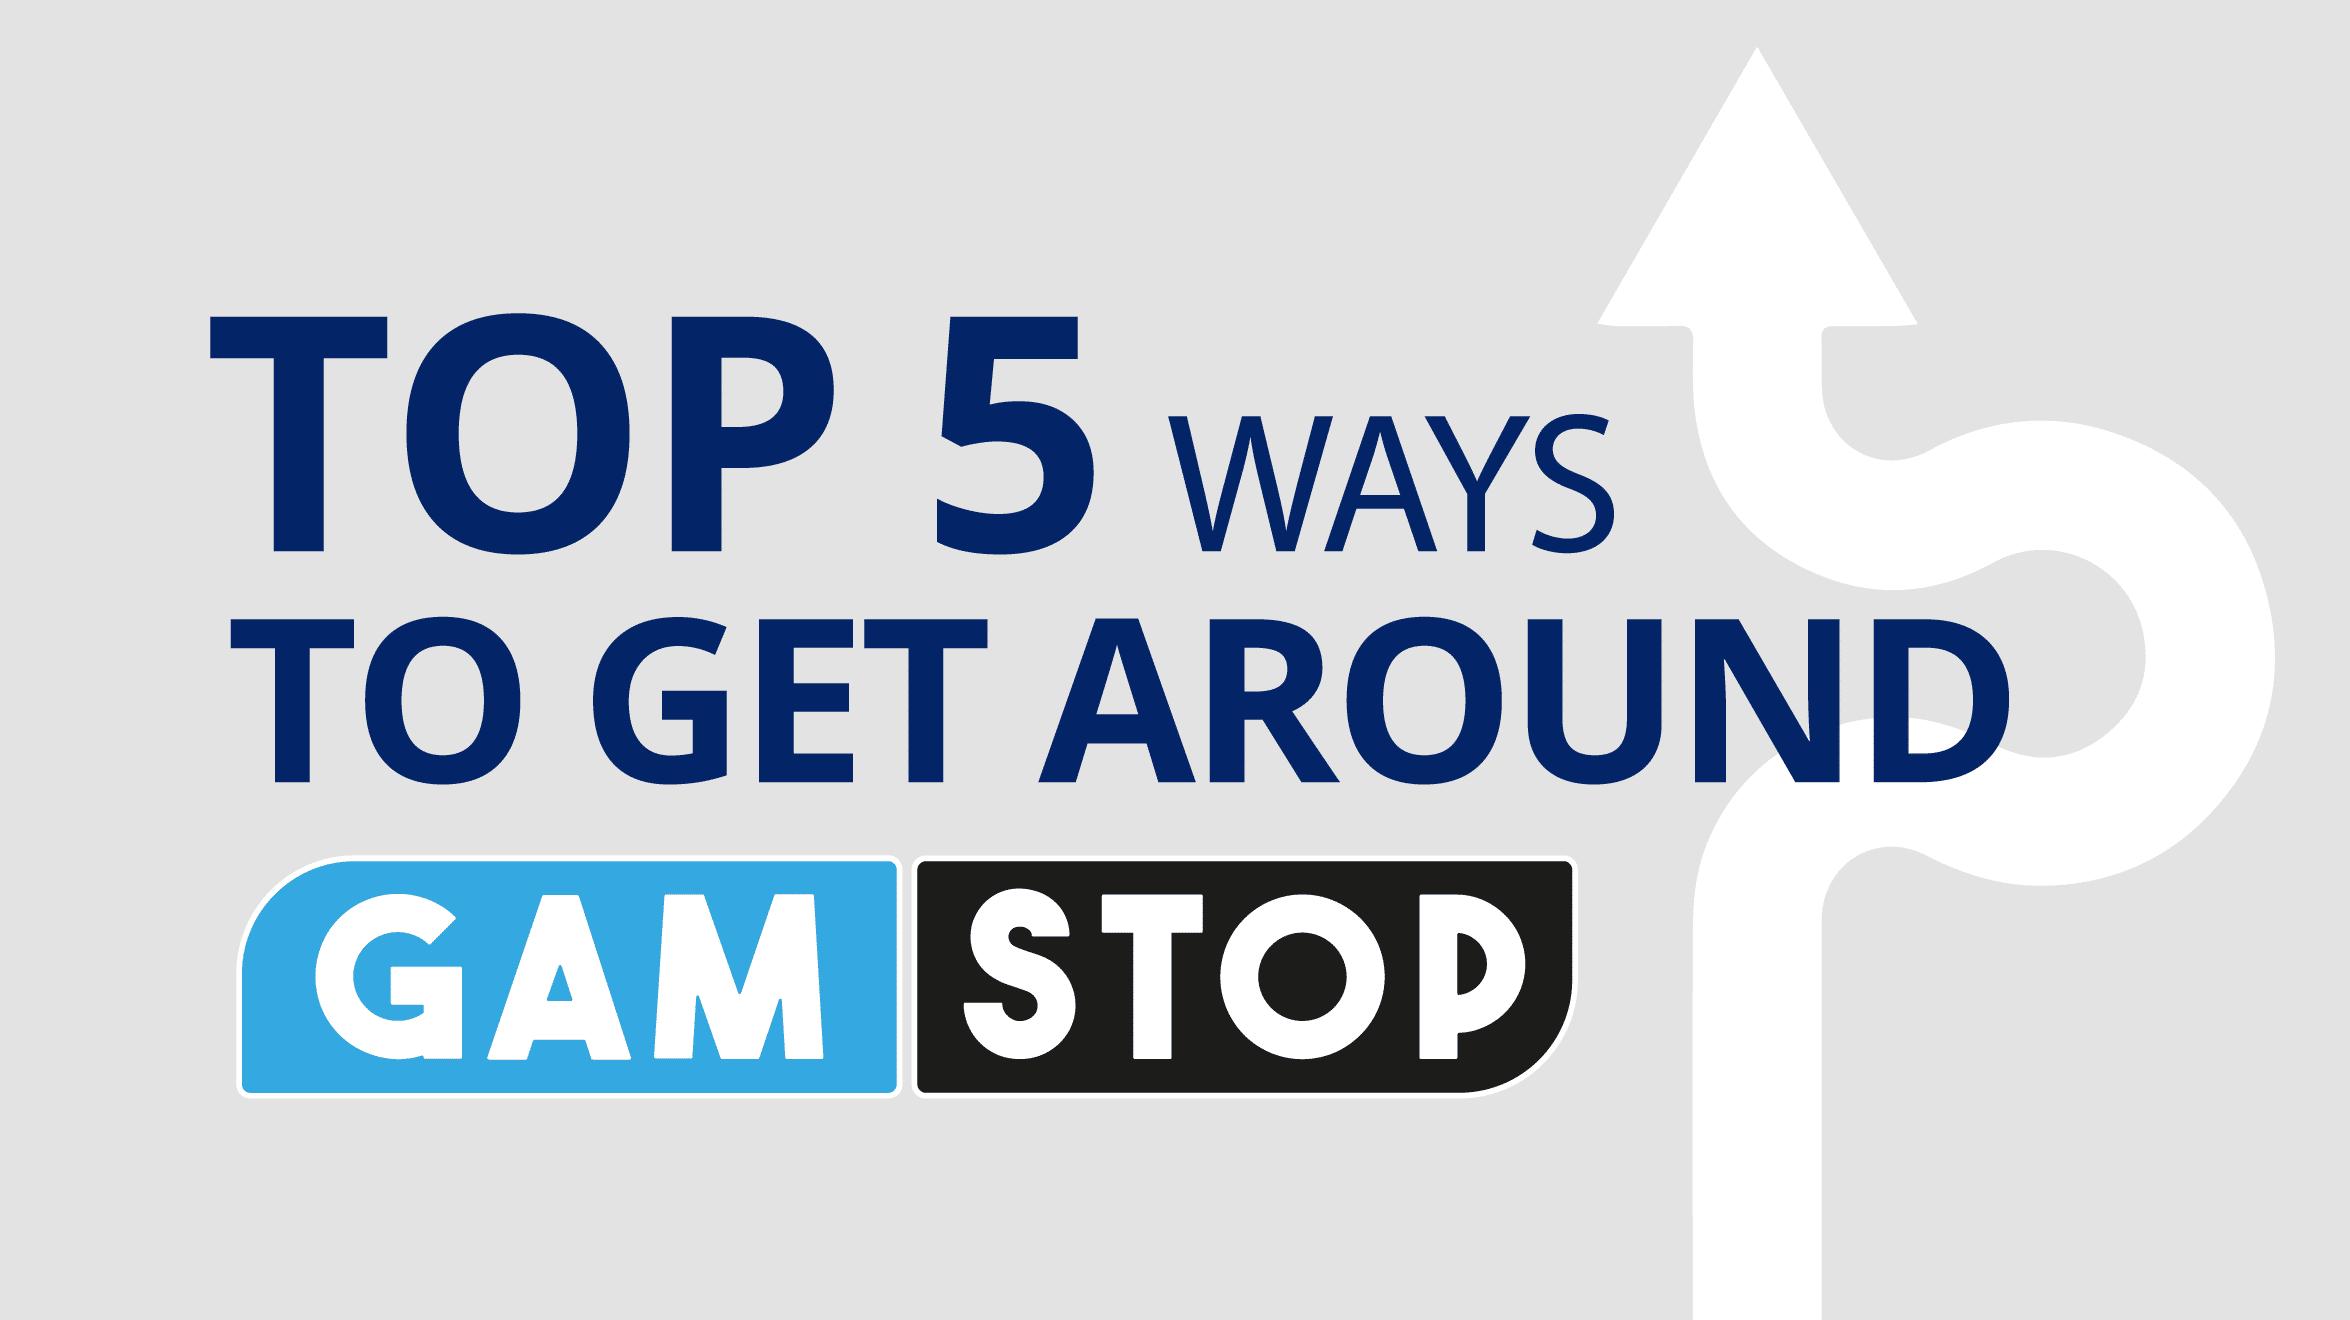 Ways to Get Around GamStop